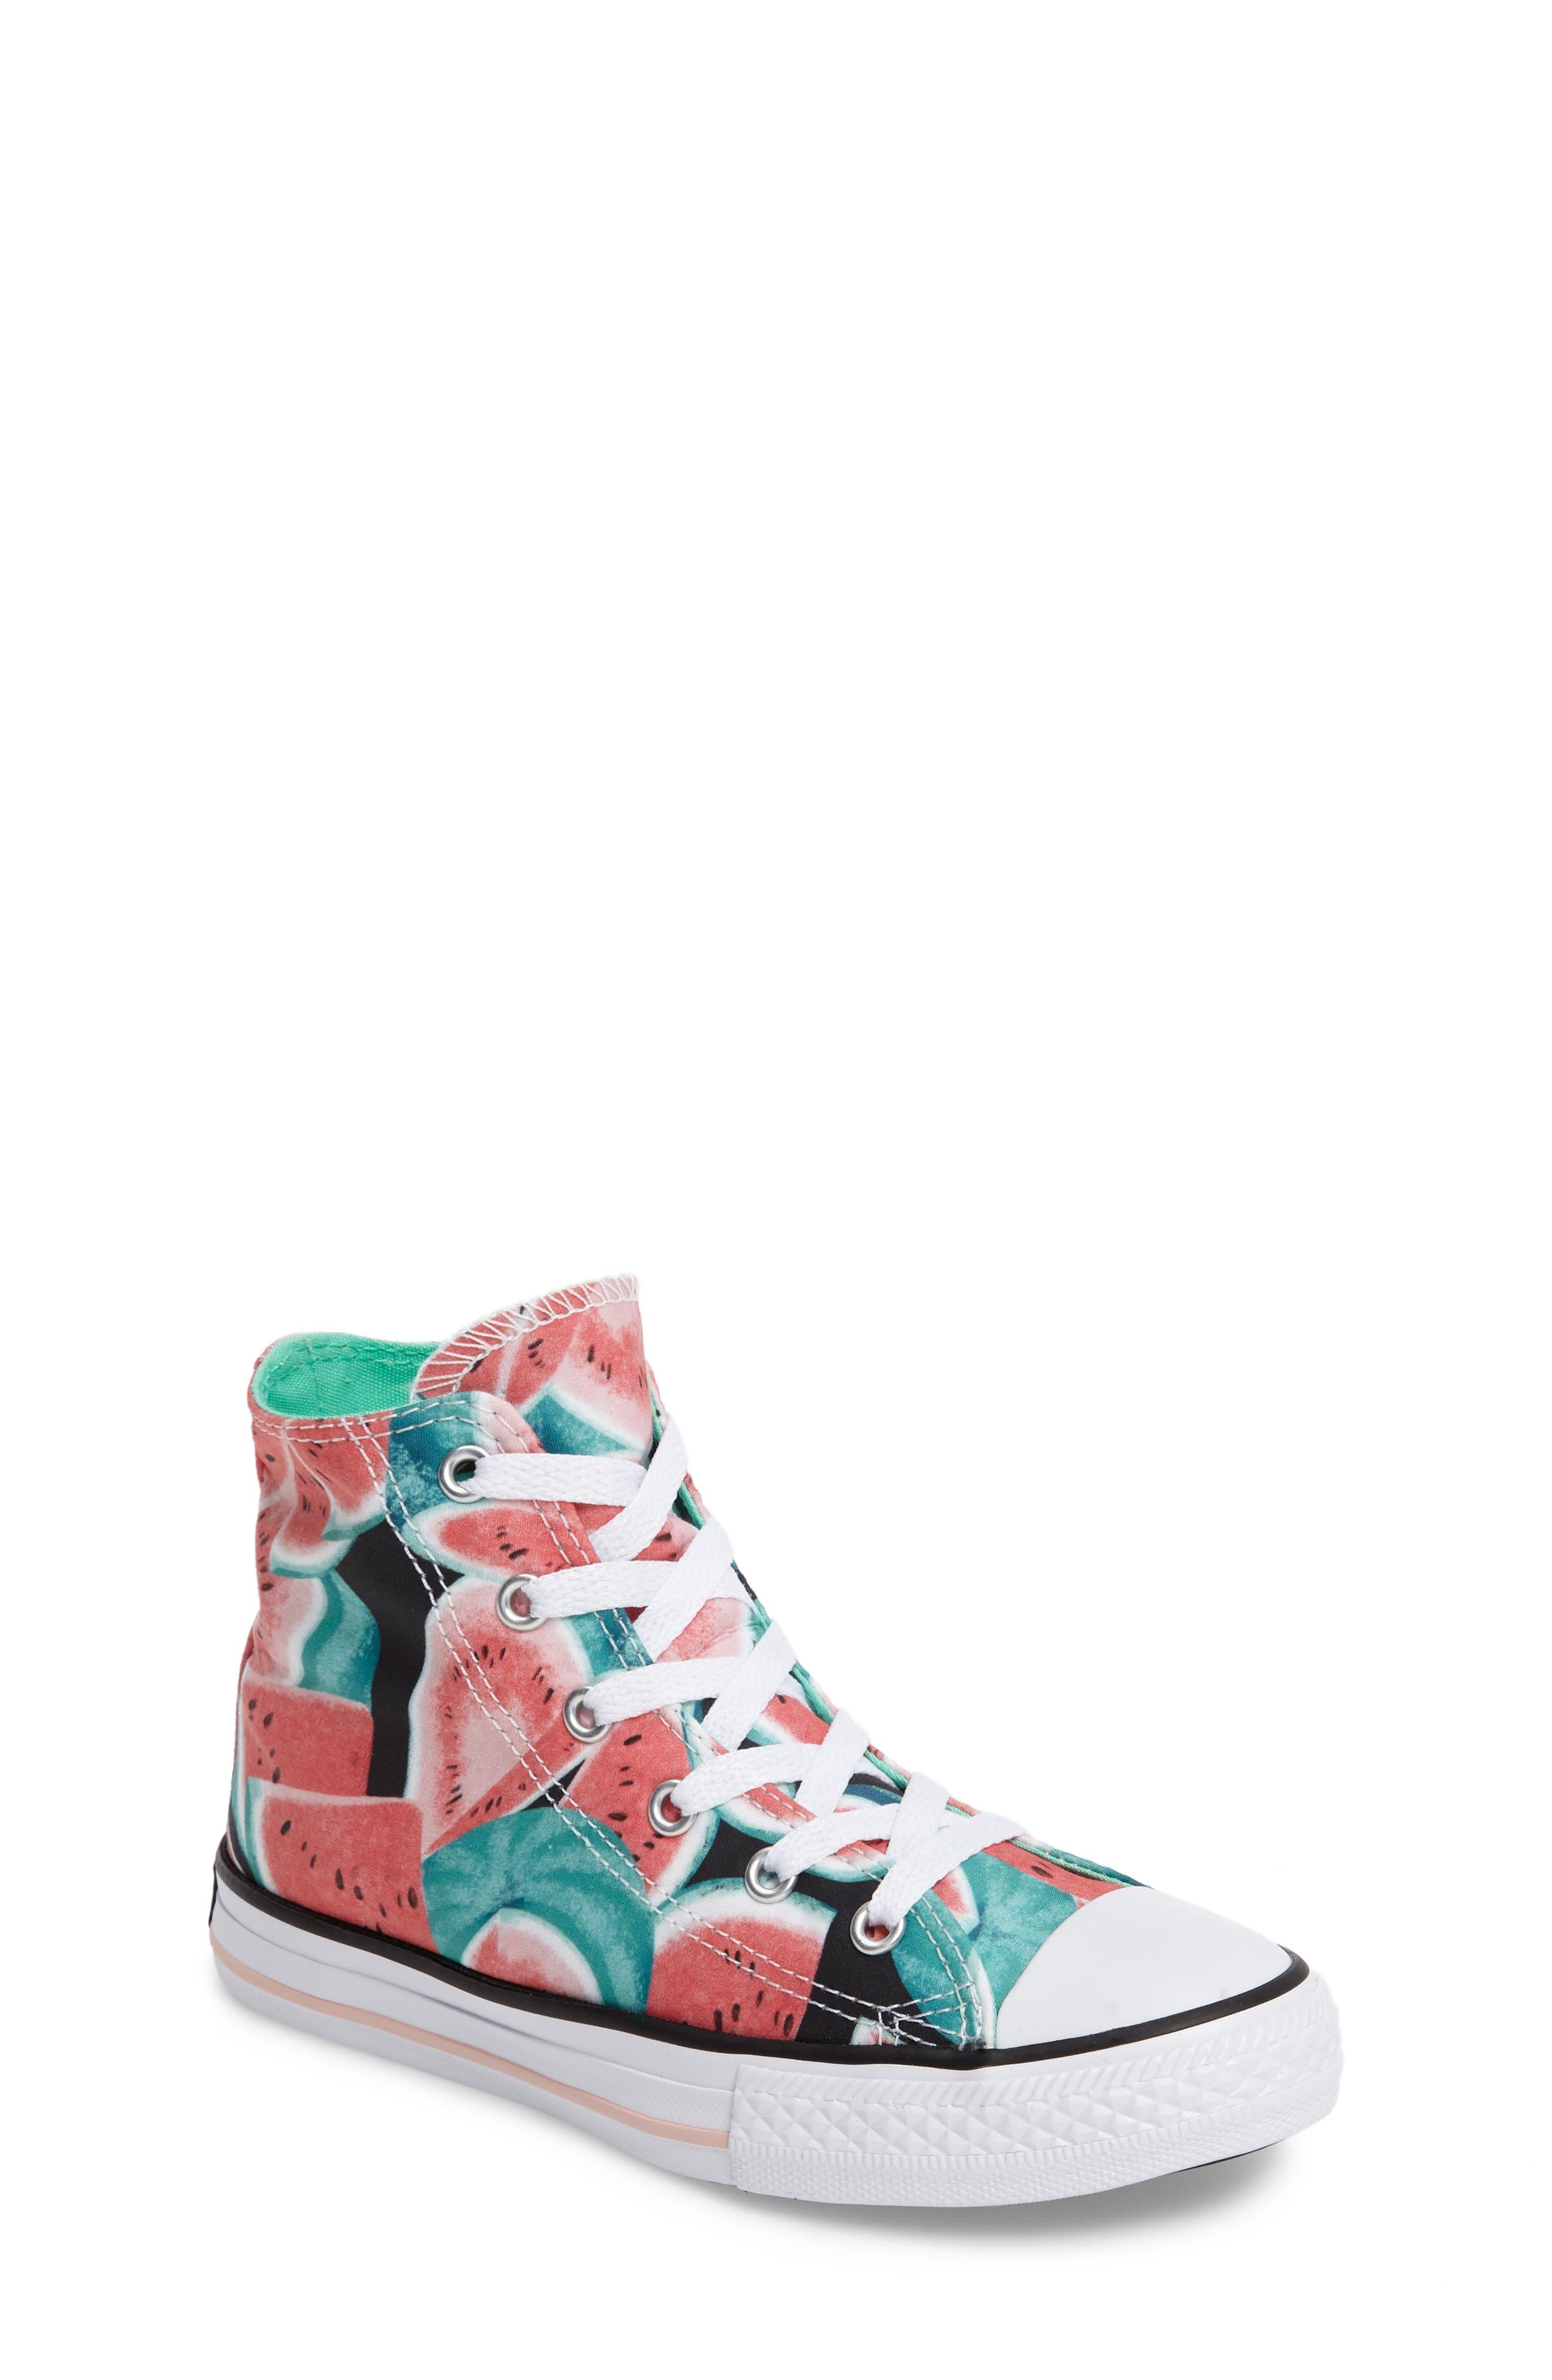 Chuck Taylor® All Star® Watermelon Print High Top Sneaker (Toddler & Little Kid)